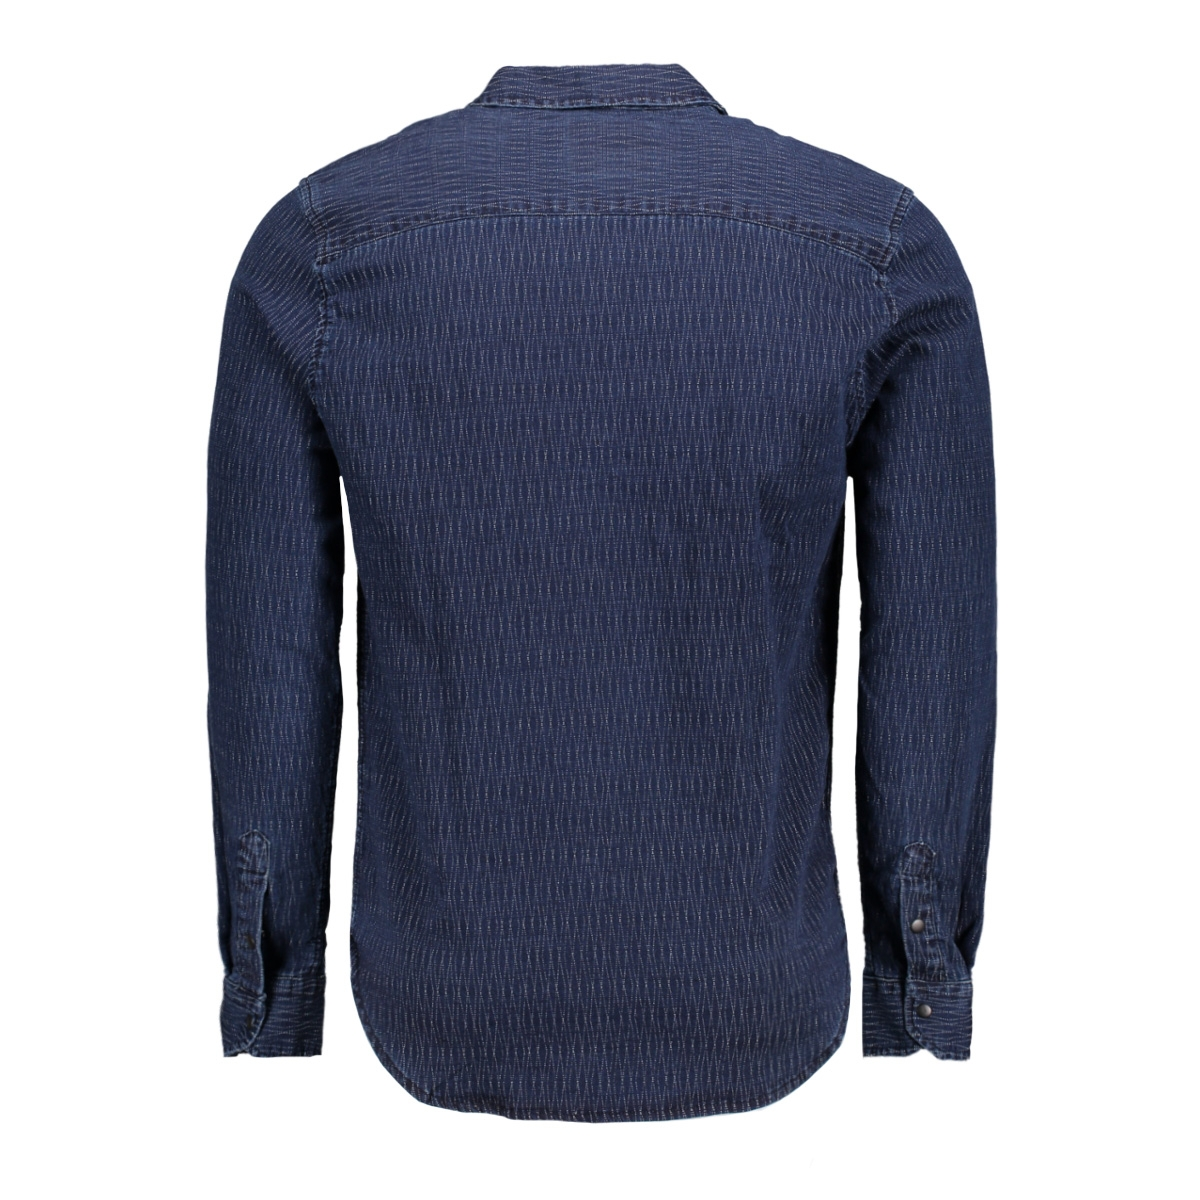 33765 gabbiano overhemd navy